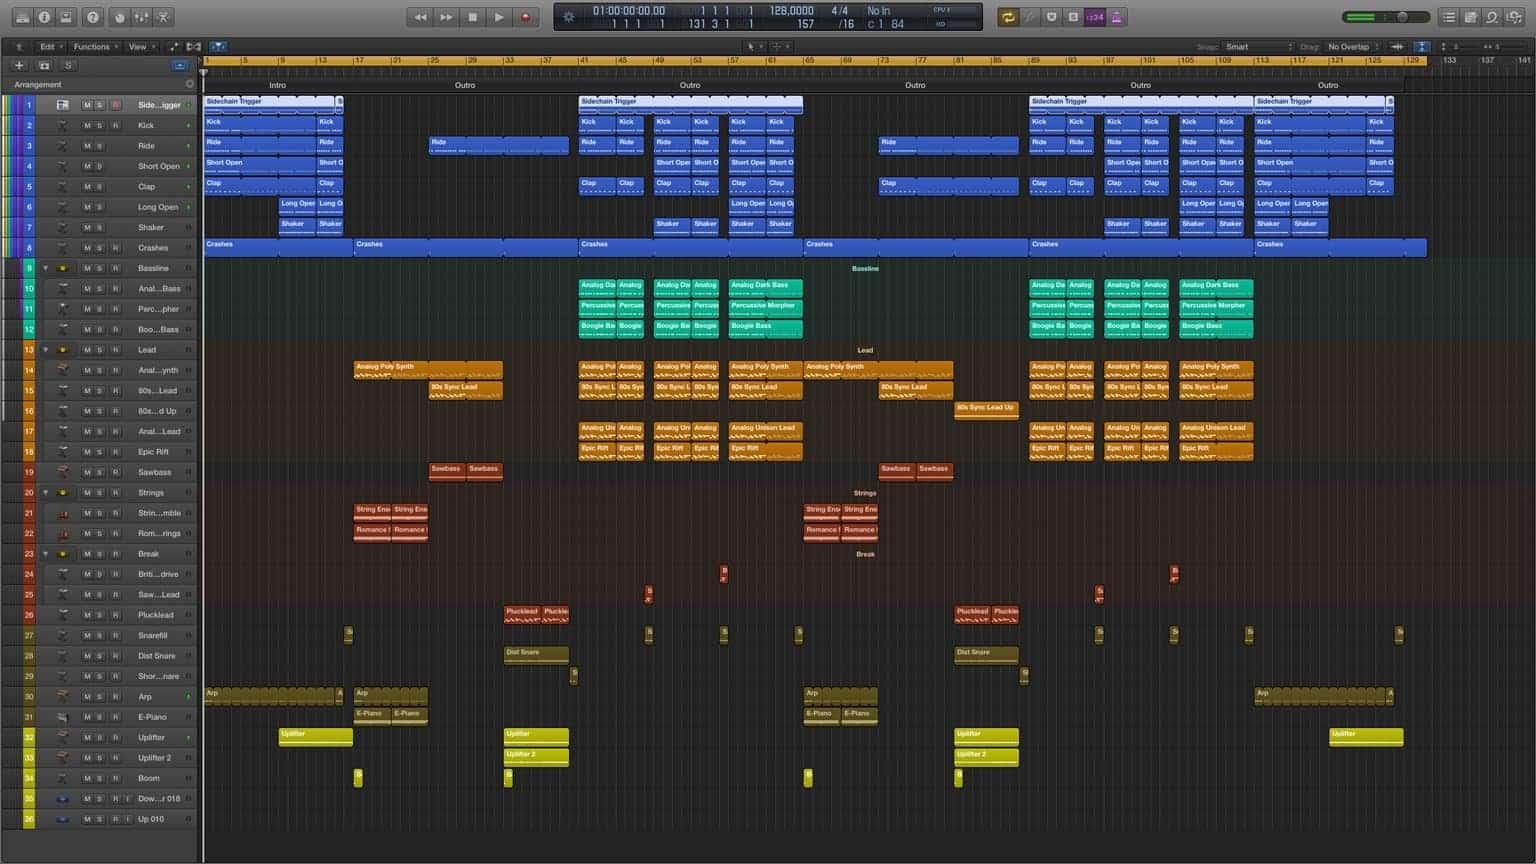 Digital-Performance-Logic-Pro-X